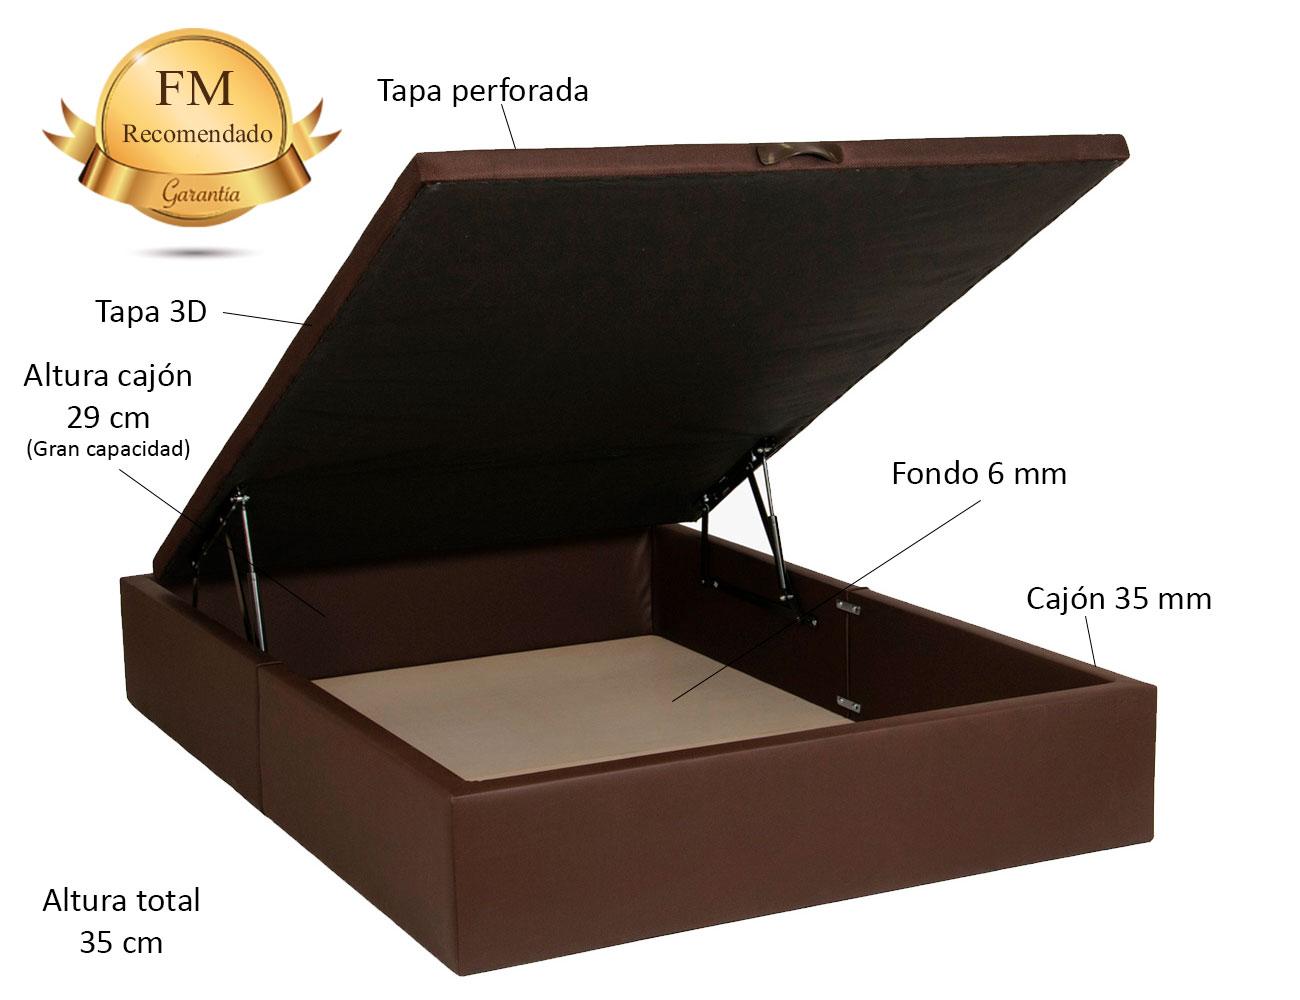 Canape polipiel chocolate recto detalle